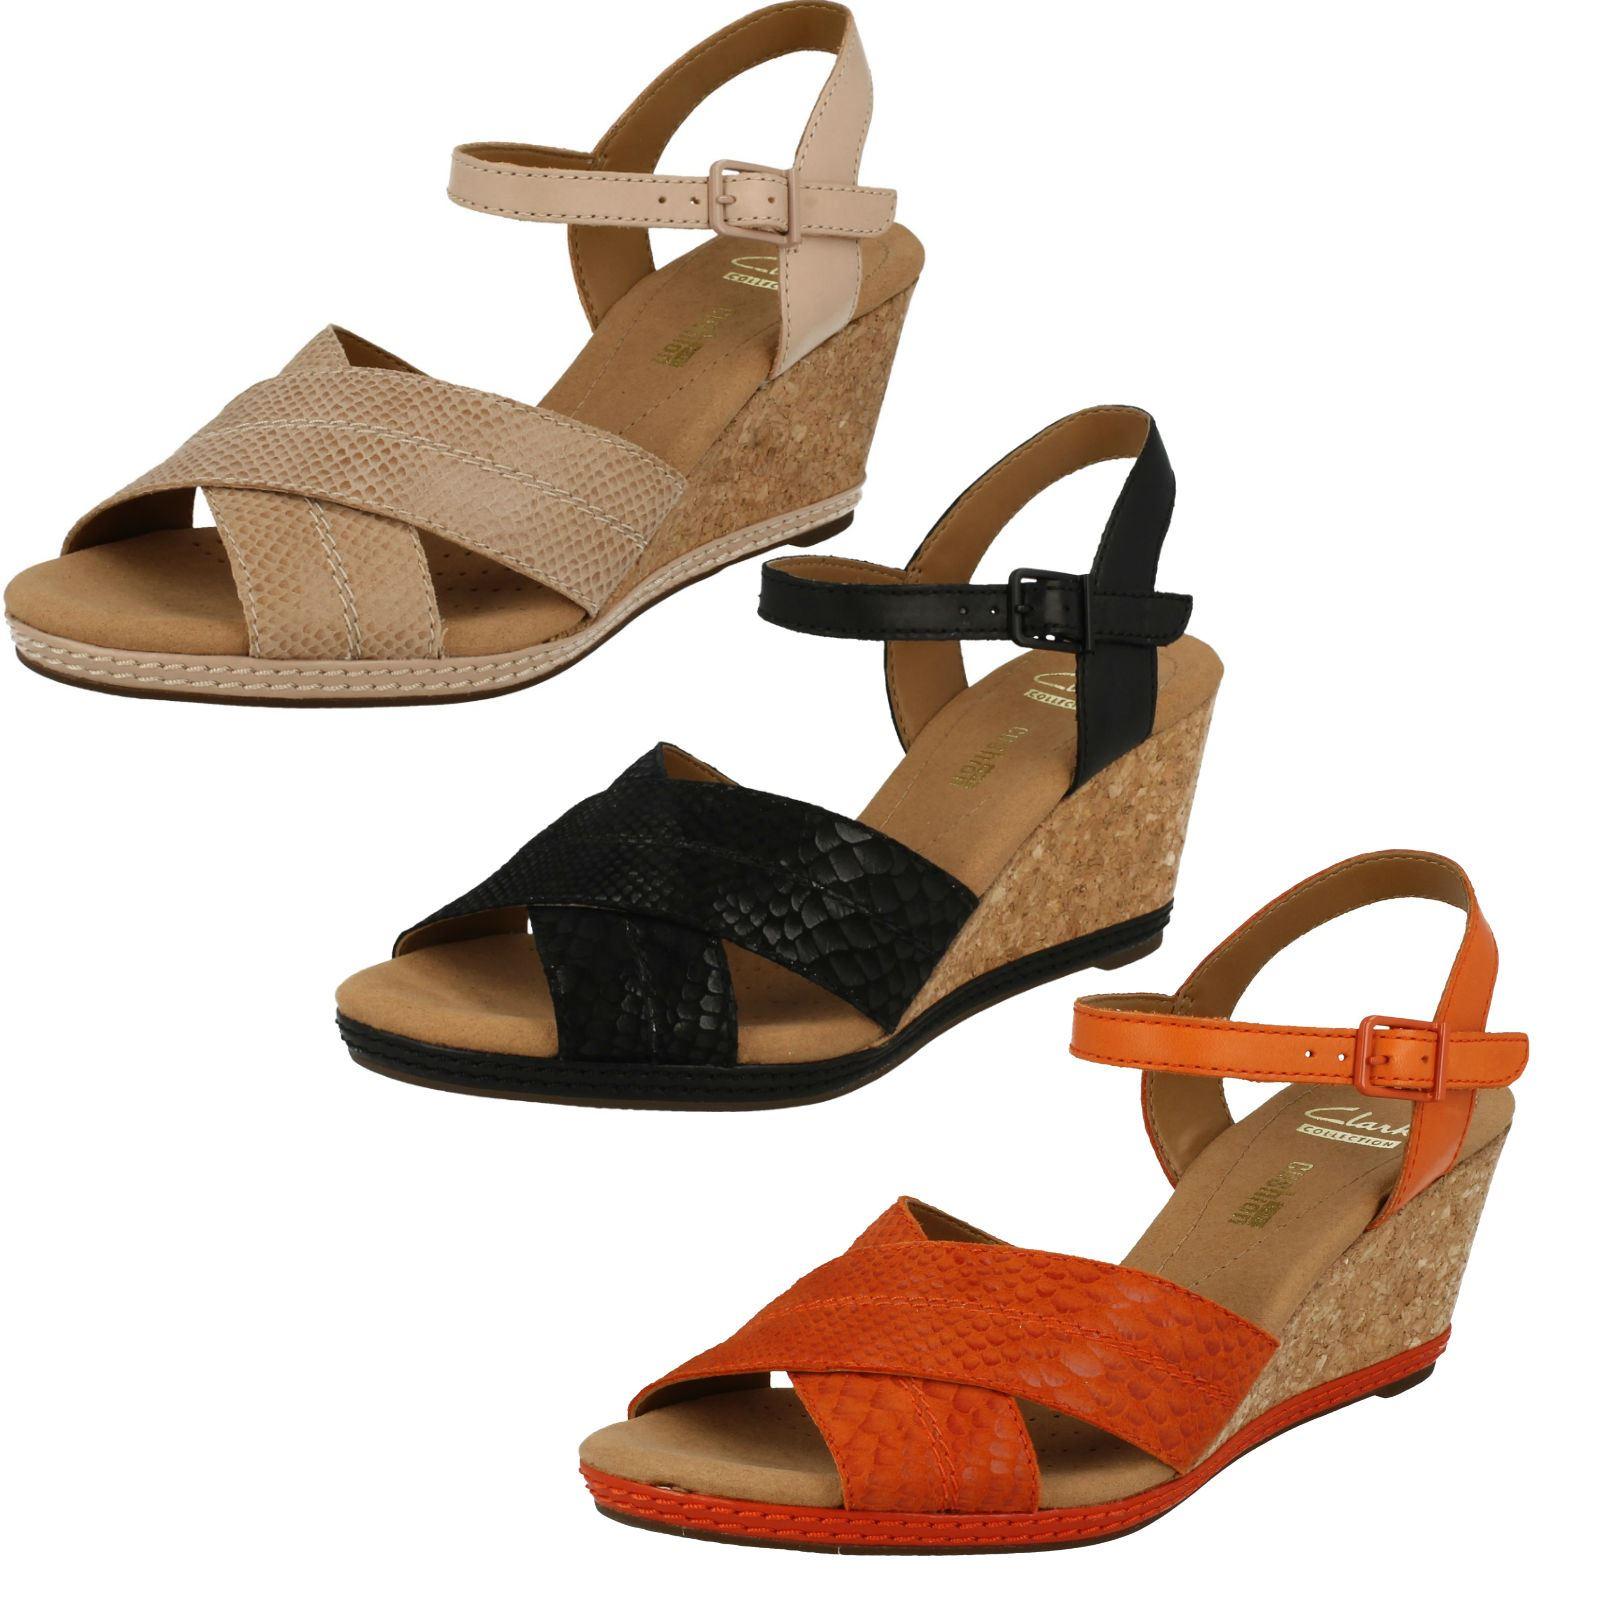 95466684686851 Ladies Clarks  Open Toe Wedge Sandals Helio Latitude